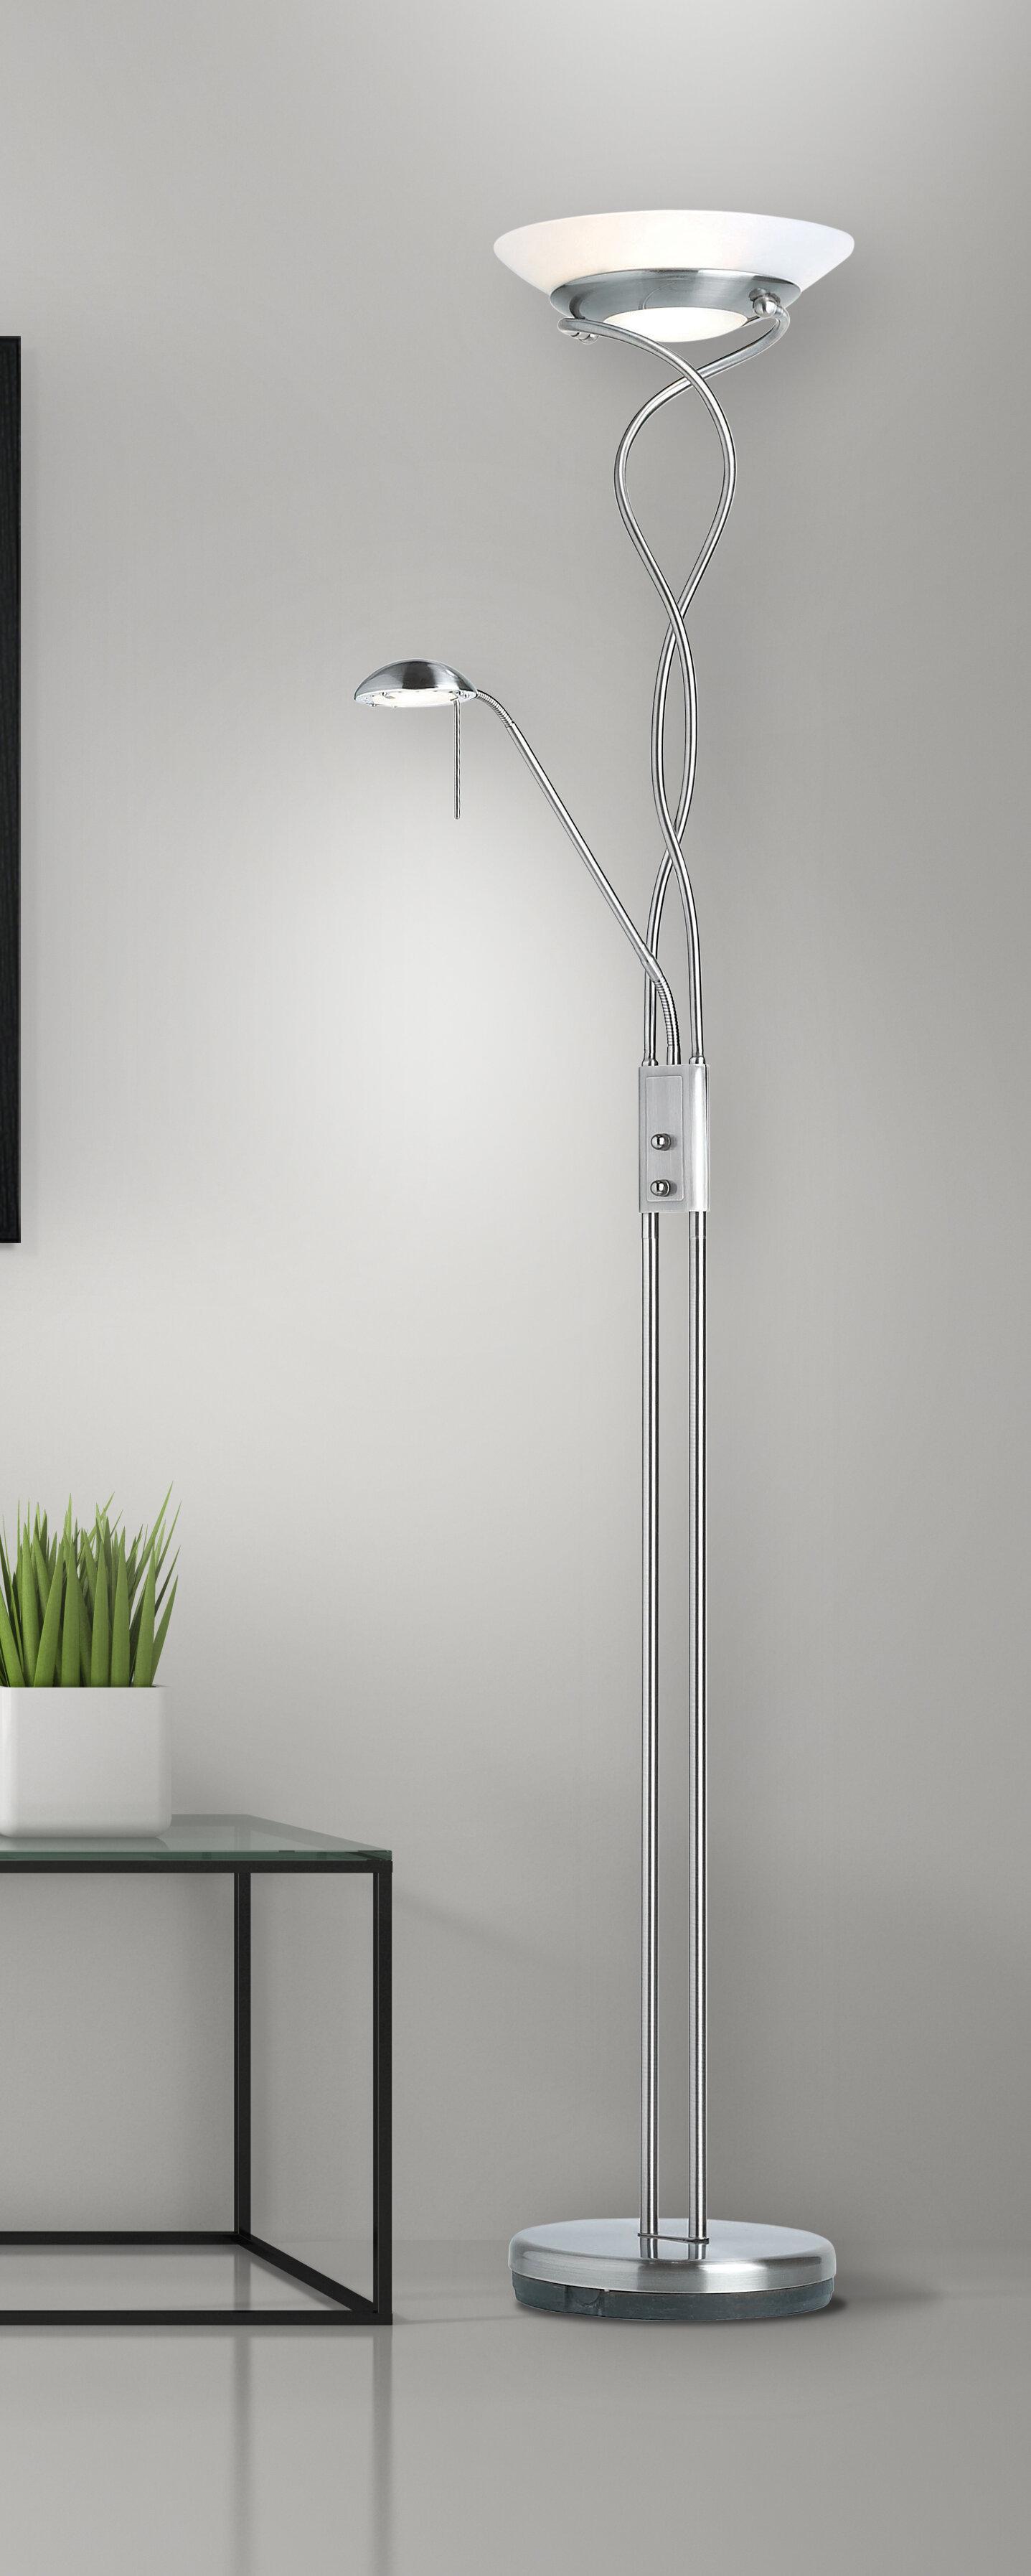 Endon Lighting Monaco 182Cm Torchiere Floor Lamp & Reviews -